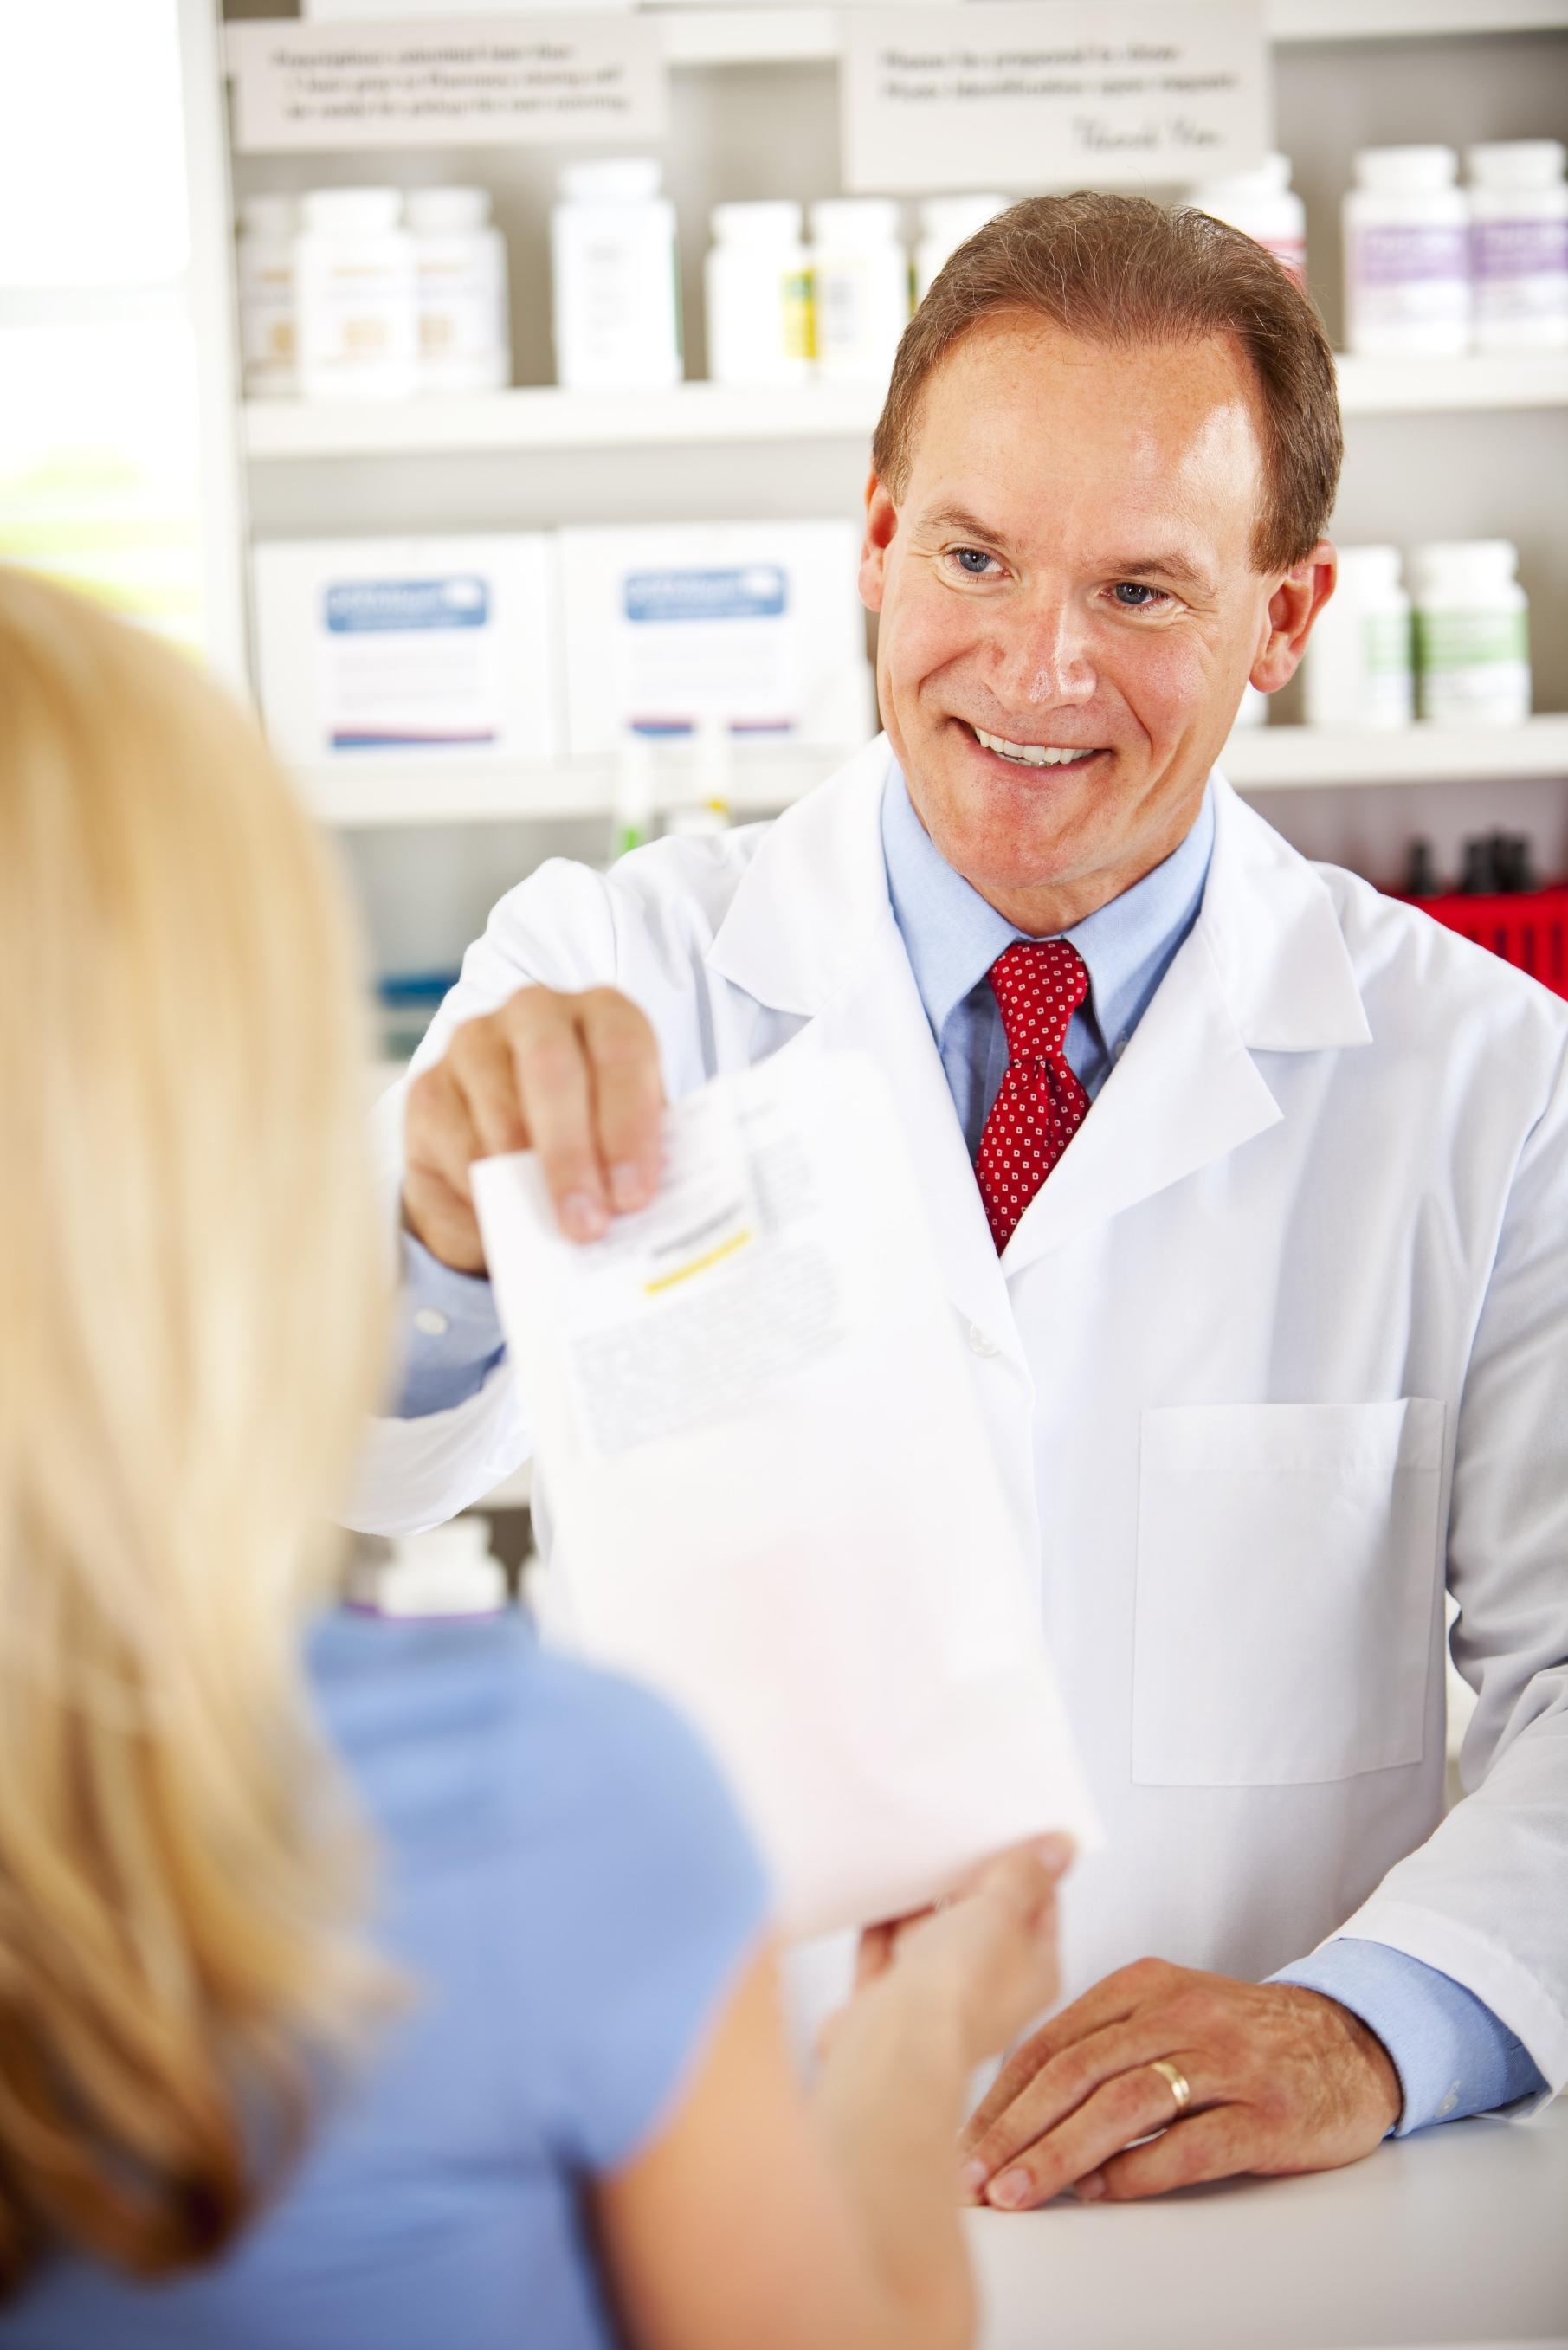 Members - Medications